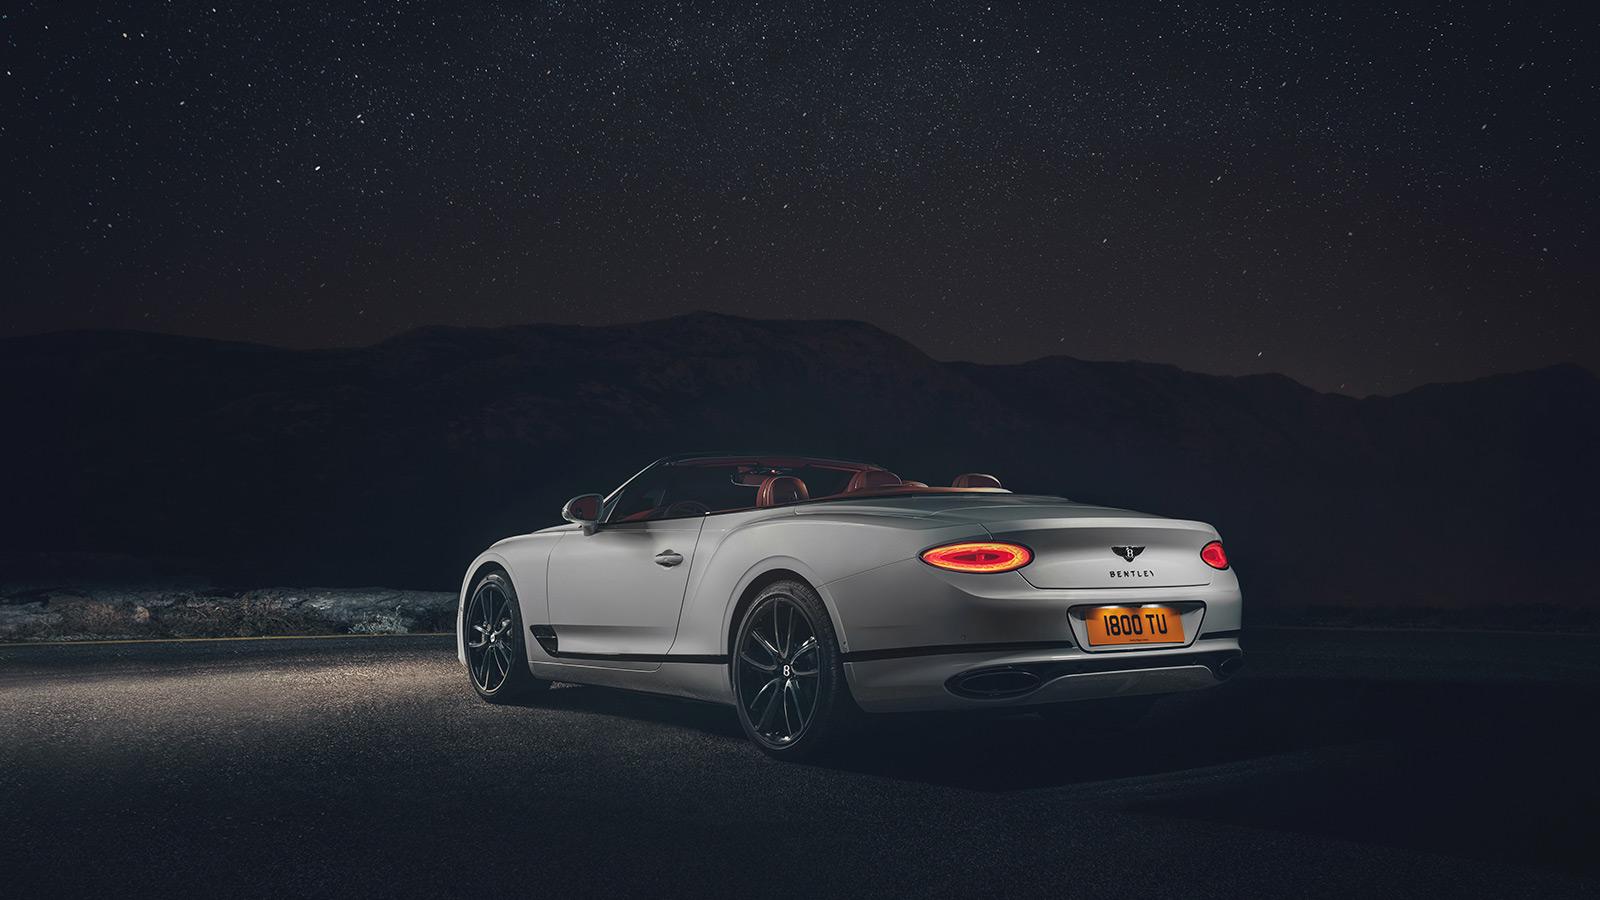 Luxury Car Wallpaper 4k 2020 Bentley Continental Gt Convertible Imboldn